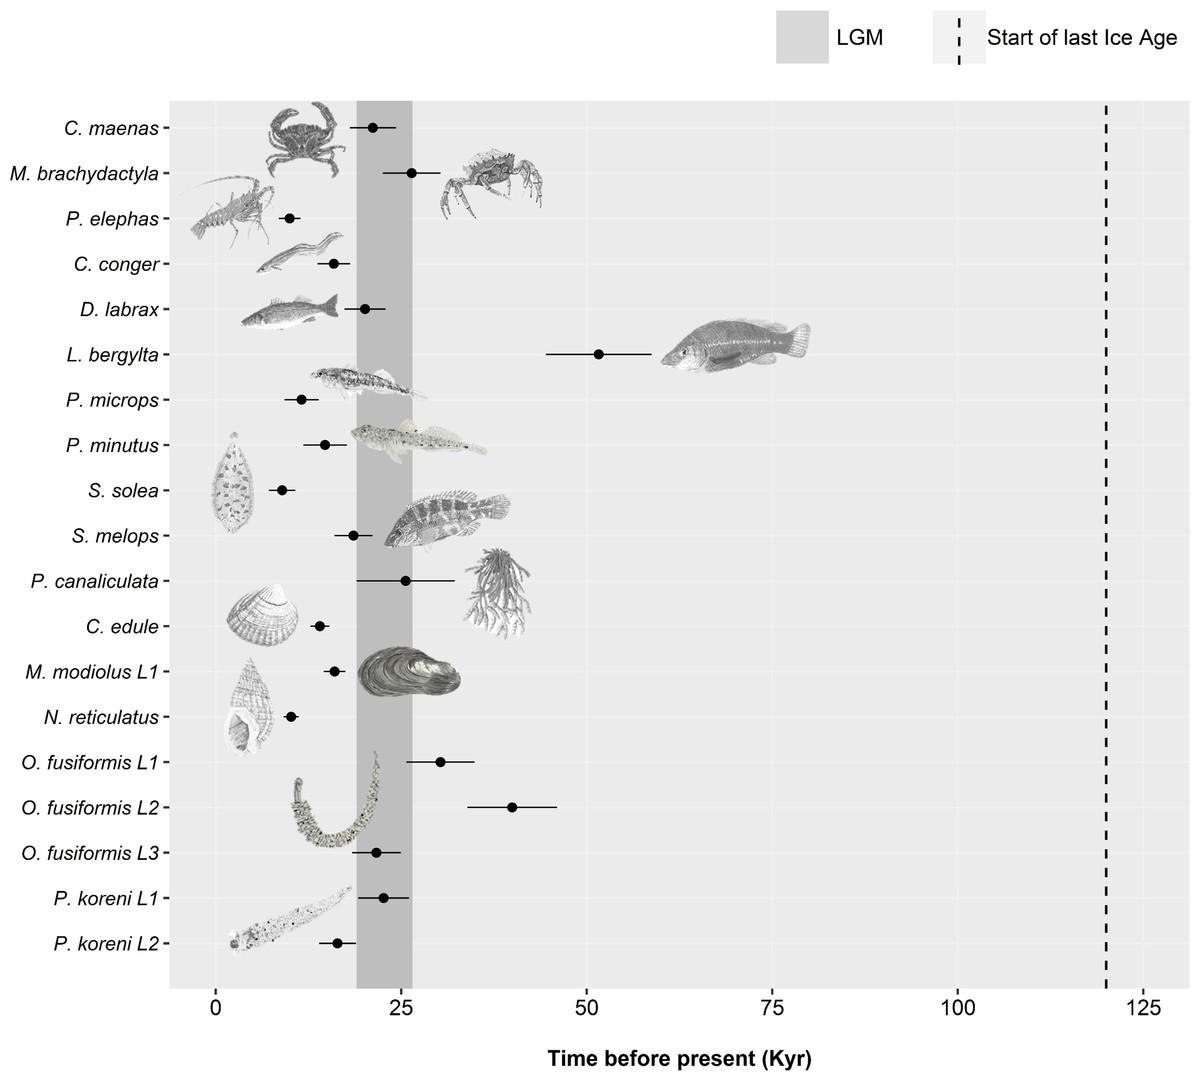 Meta-analysis of northeast Atlantic marine taxa shows